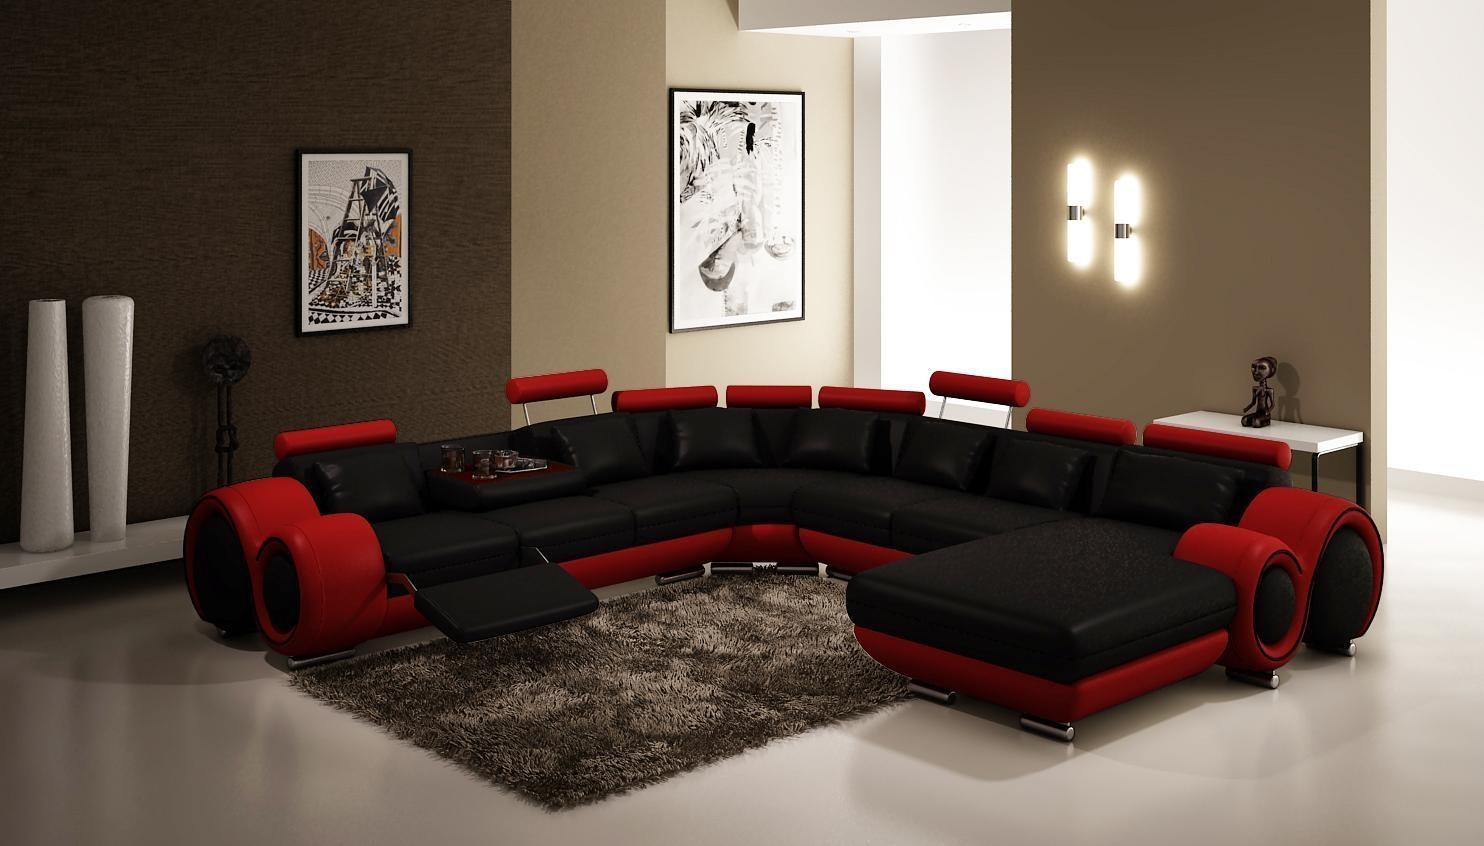 Modern Black And Red Sectional Sofa Set – Kenya For Black And Red Sofa Sets (View 20 of 20)